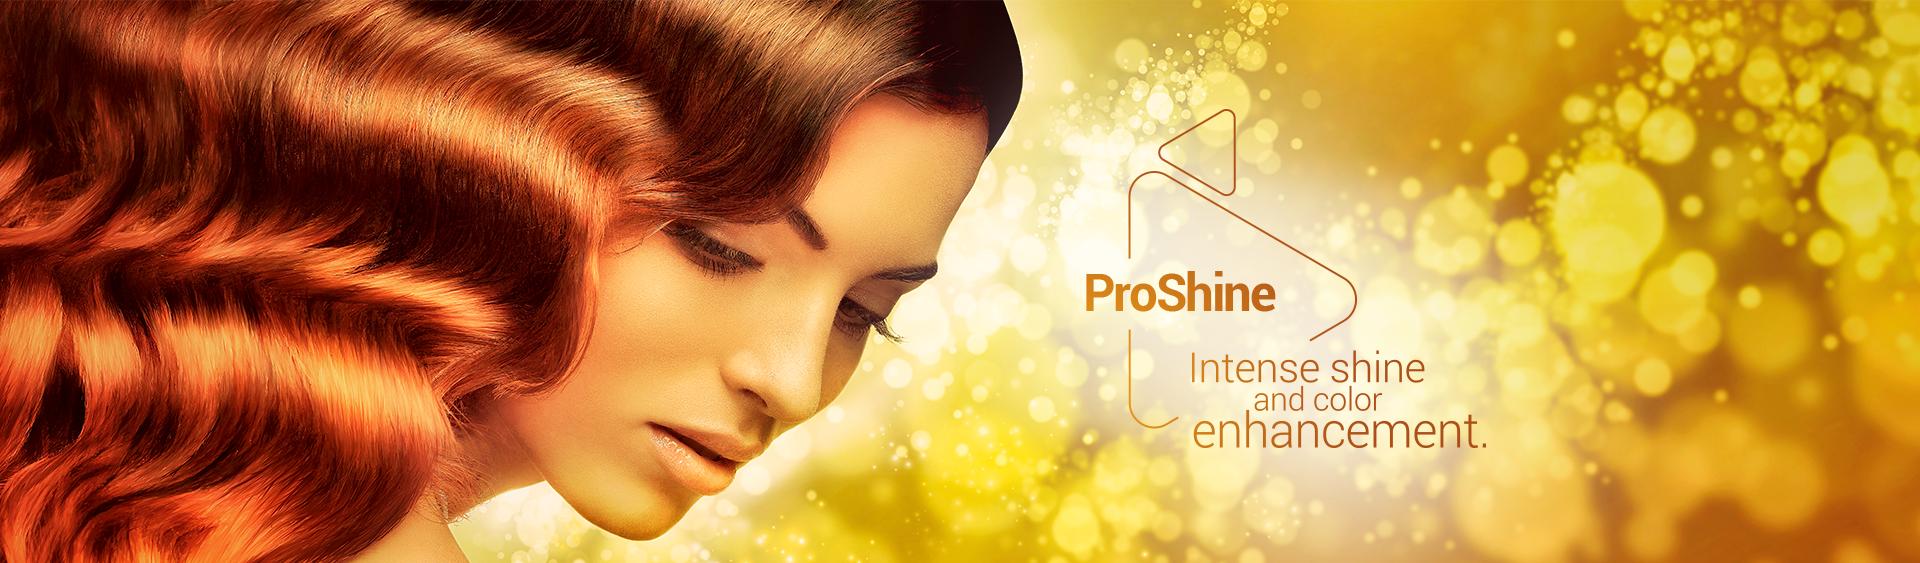 ProShine launch